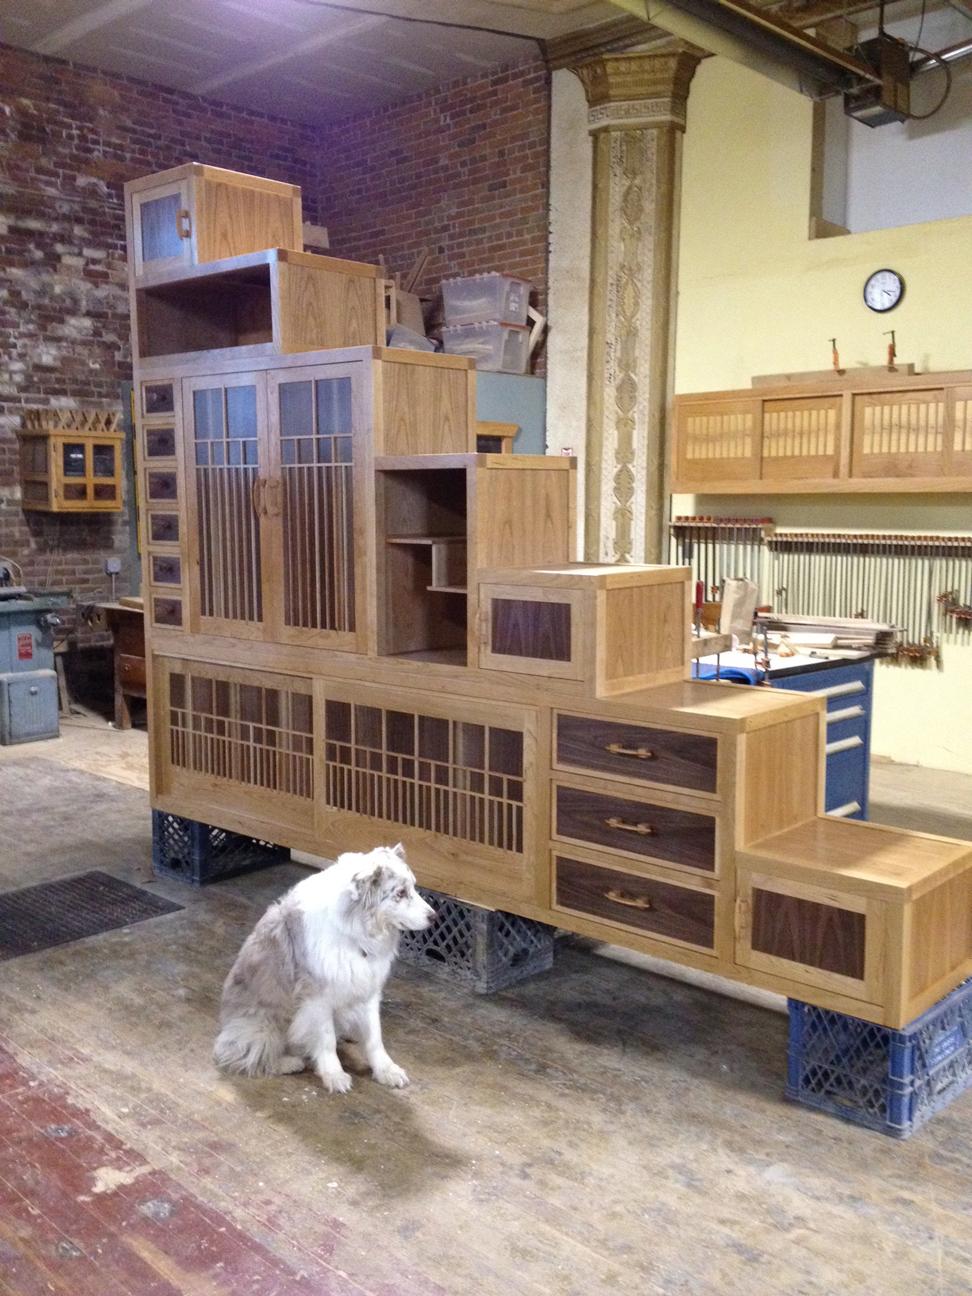 Nojo Design: Large Step Cabinet: February 2012